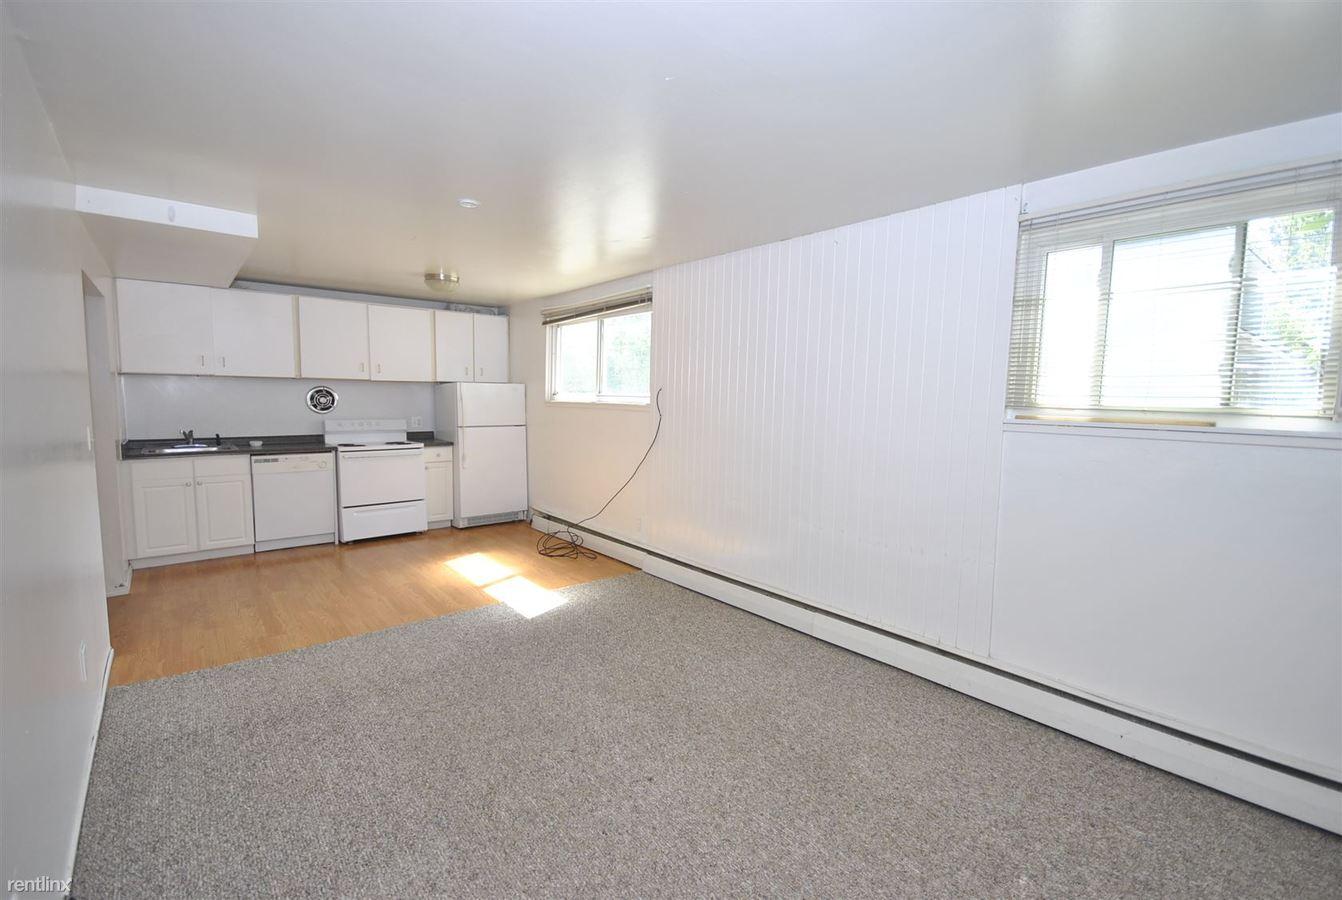 1 Bedroom 1 Bathroom Apartment for rent at 1026 Vaughn St in Ann Arbor, MI